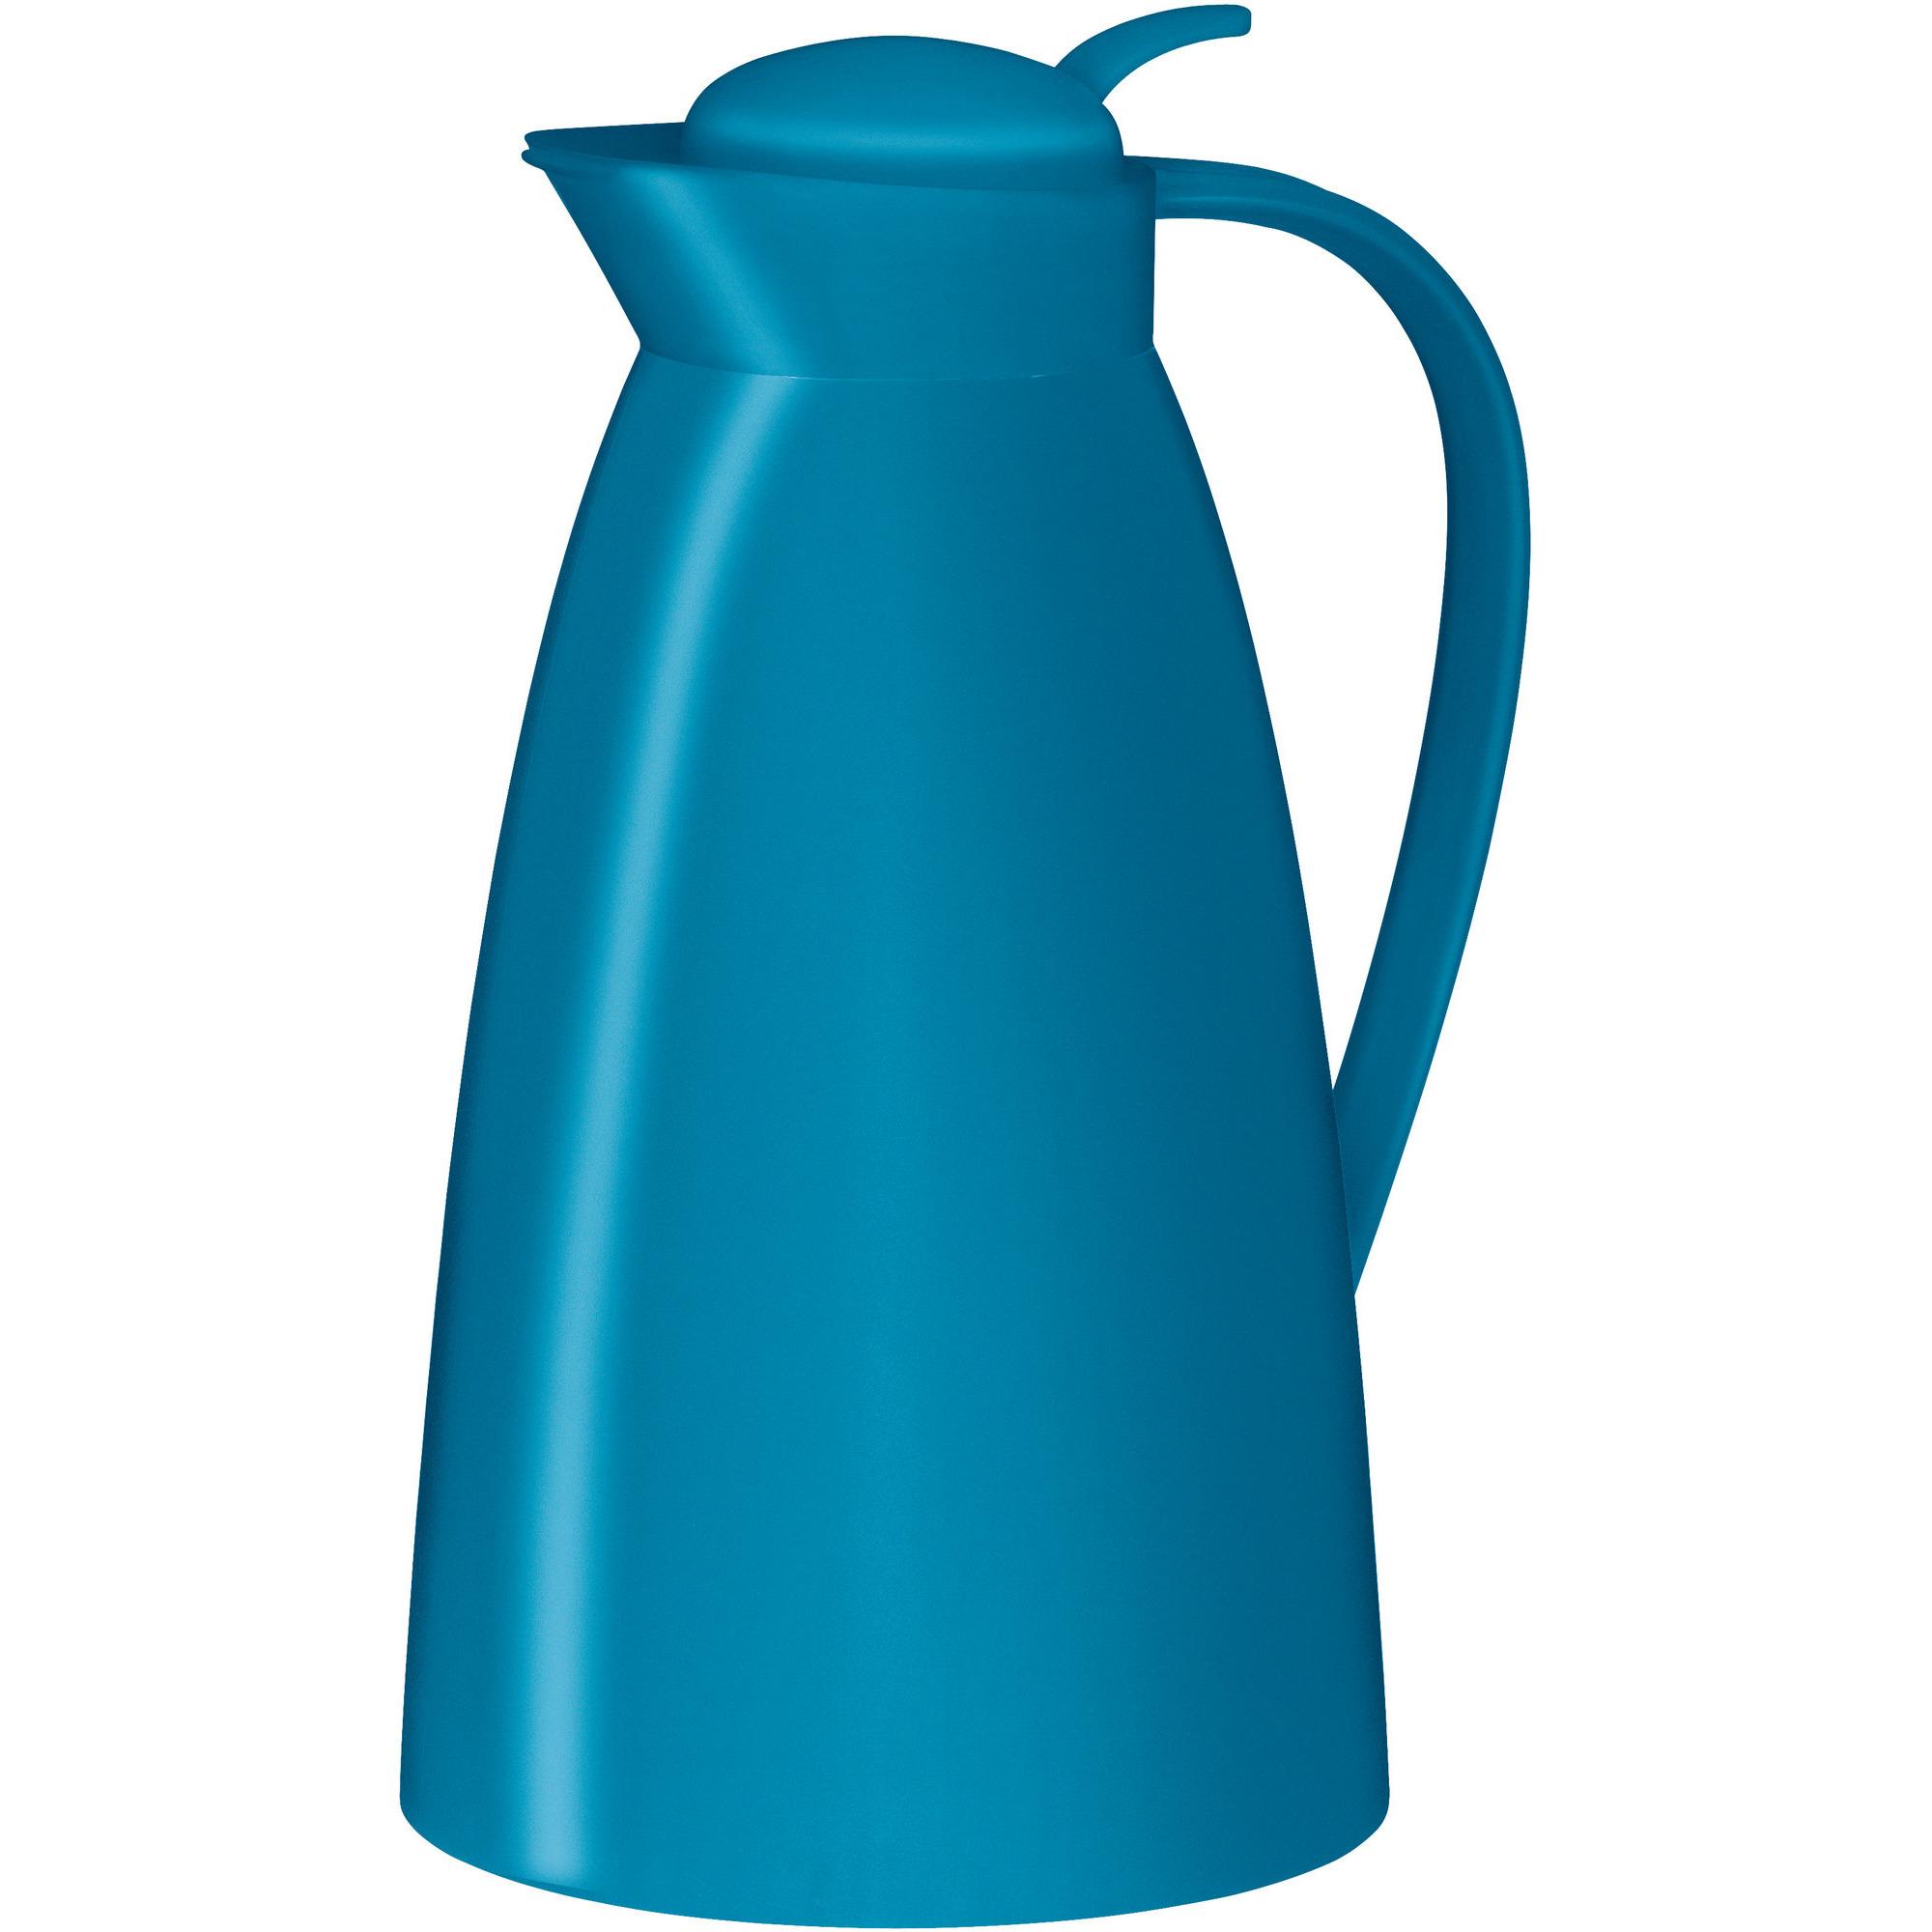 Alfi Eco termoskanna – blå